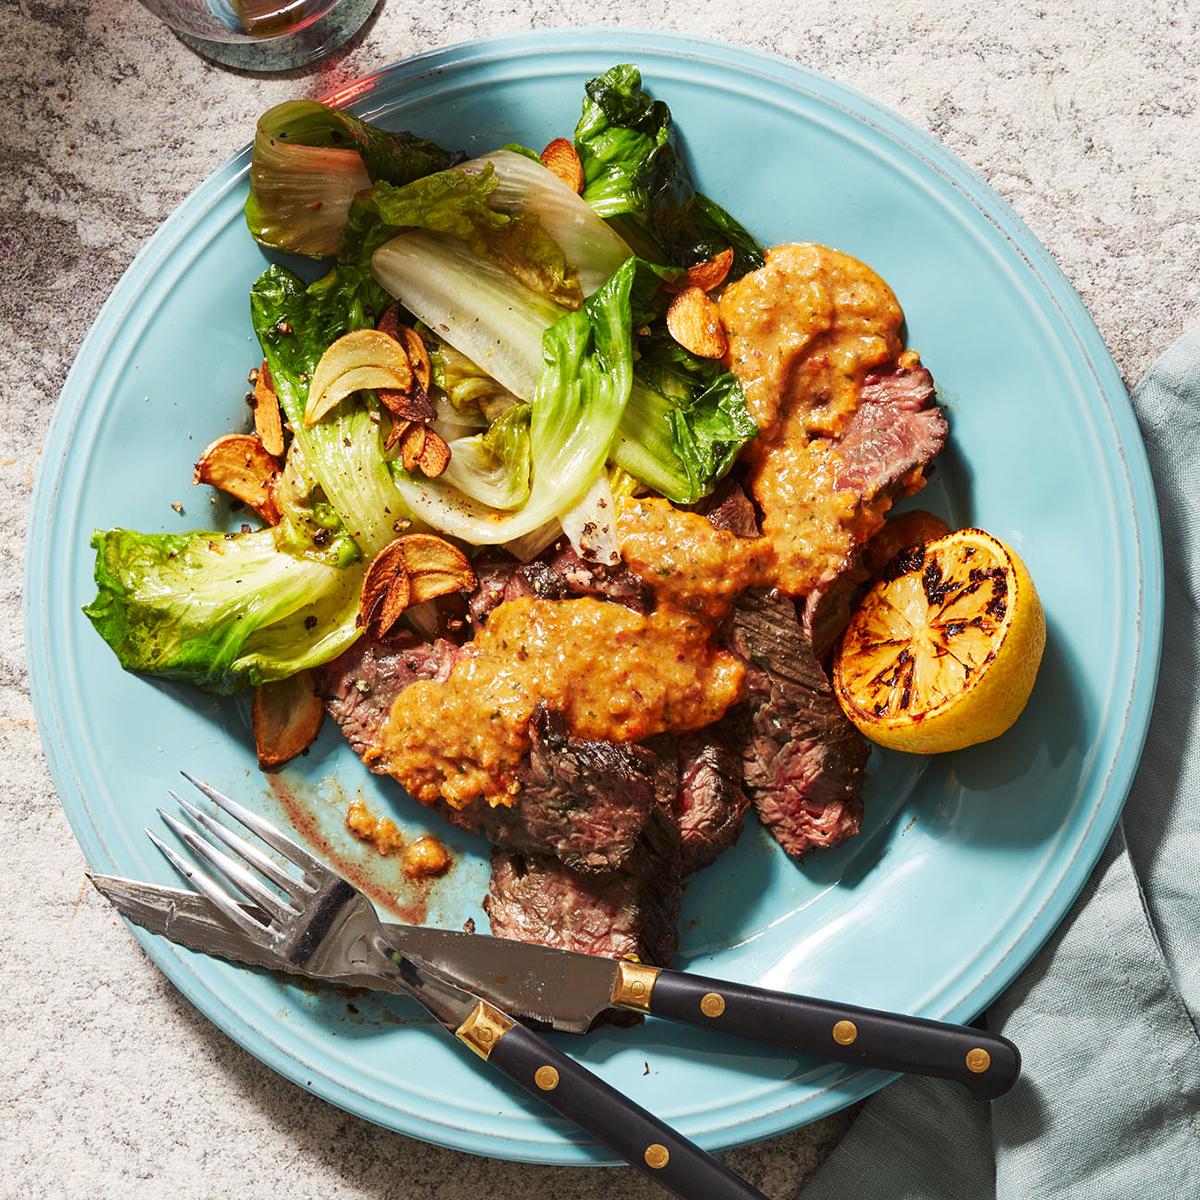 steak with romesco sauce